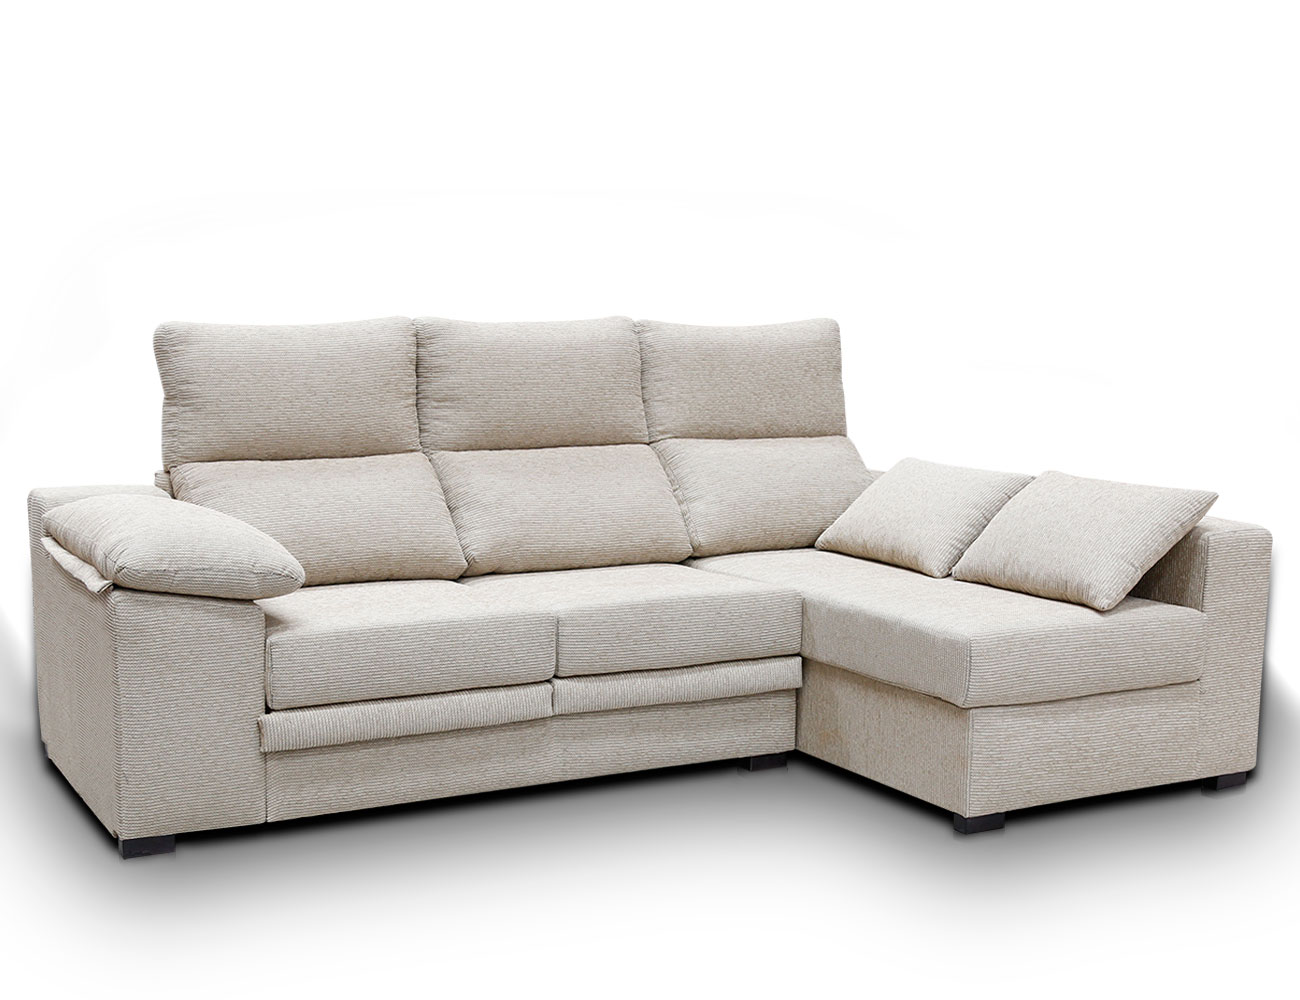 Sofa chaiselongue moderno cojin pardo 1